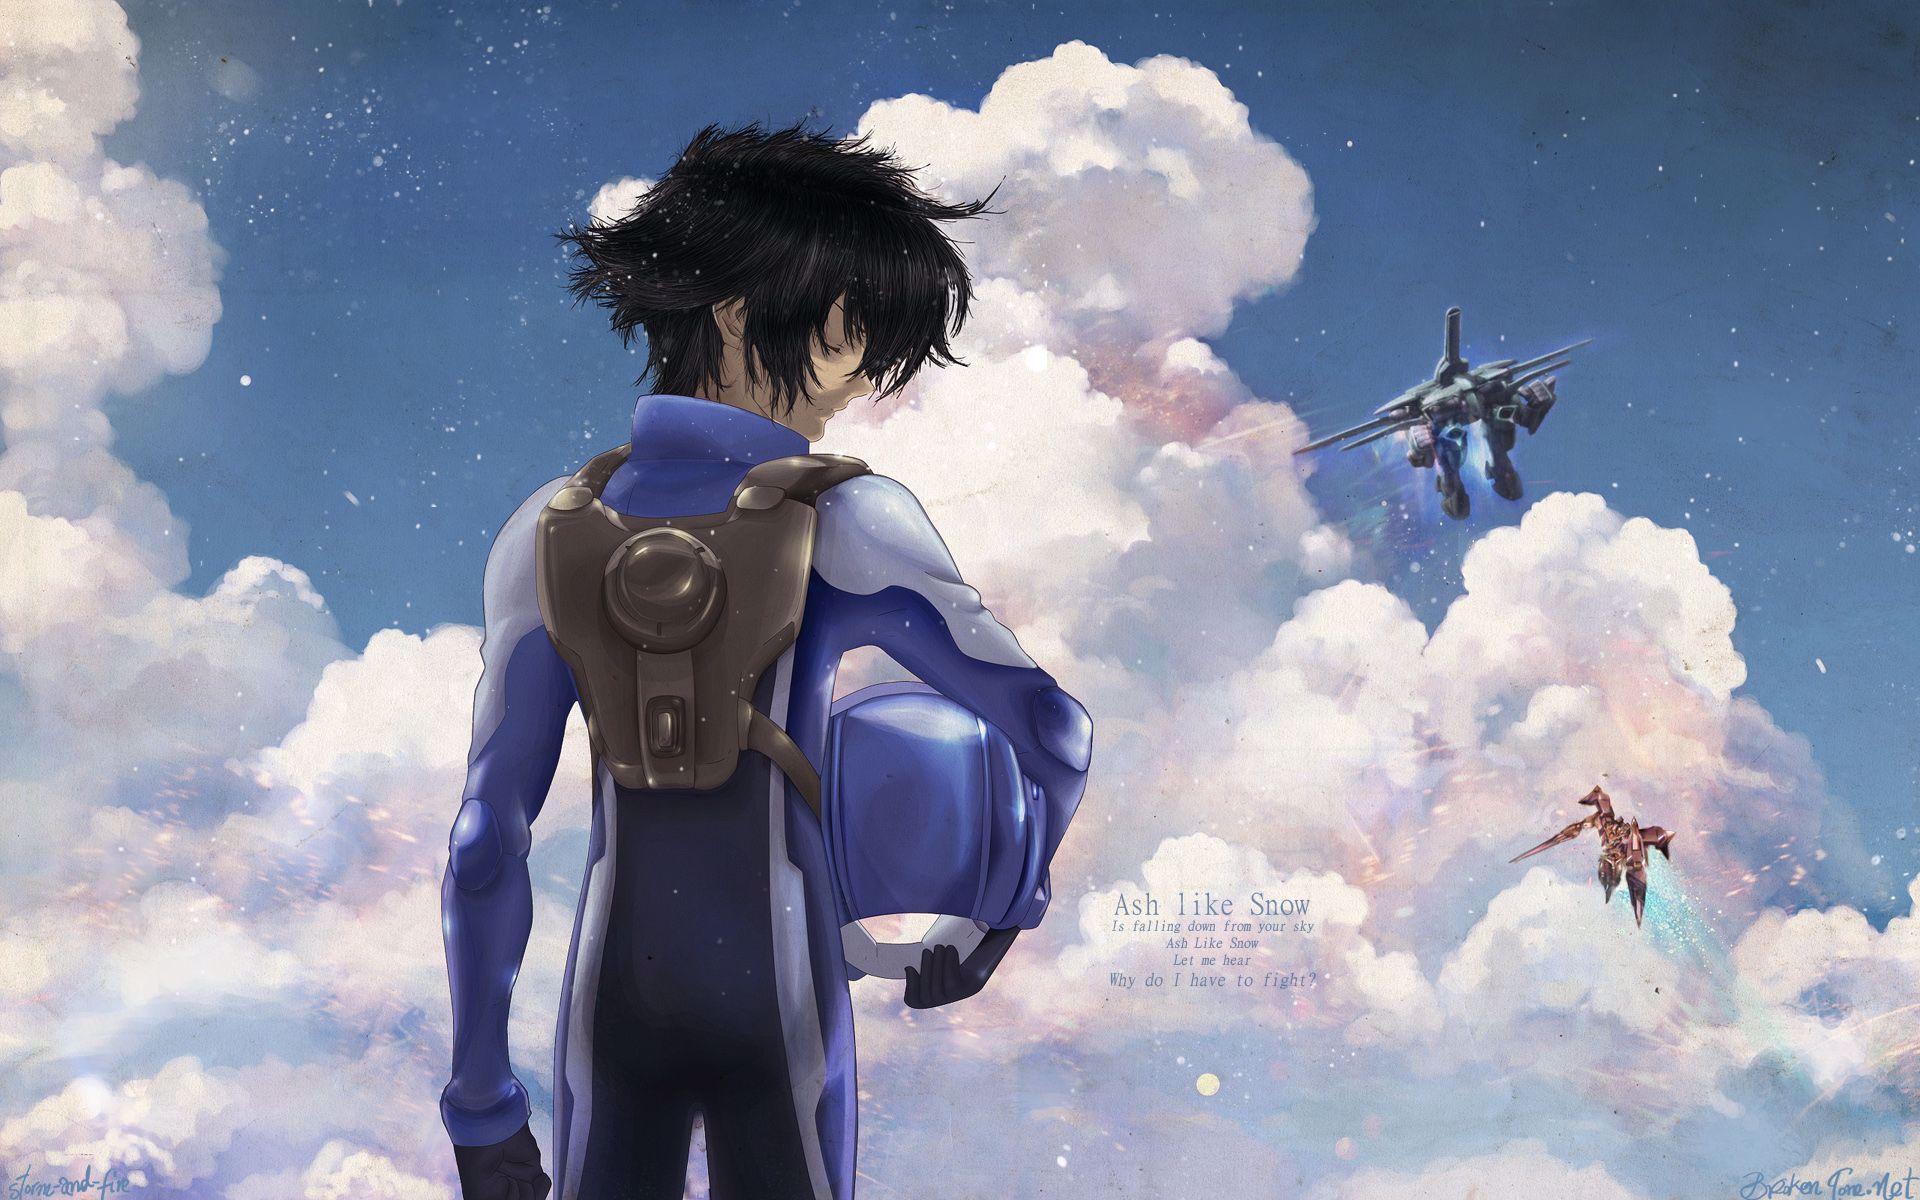 Anime Gundam Mobile Suit Gundam Mobil Suit Gundam 00 Wallpaper